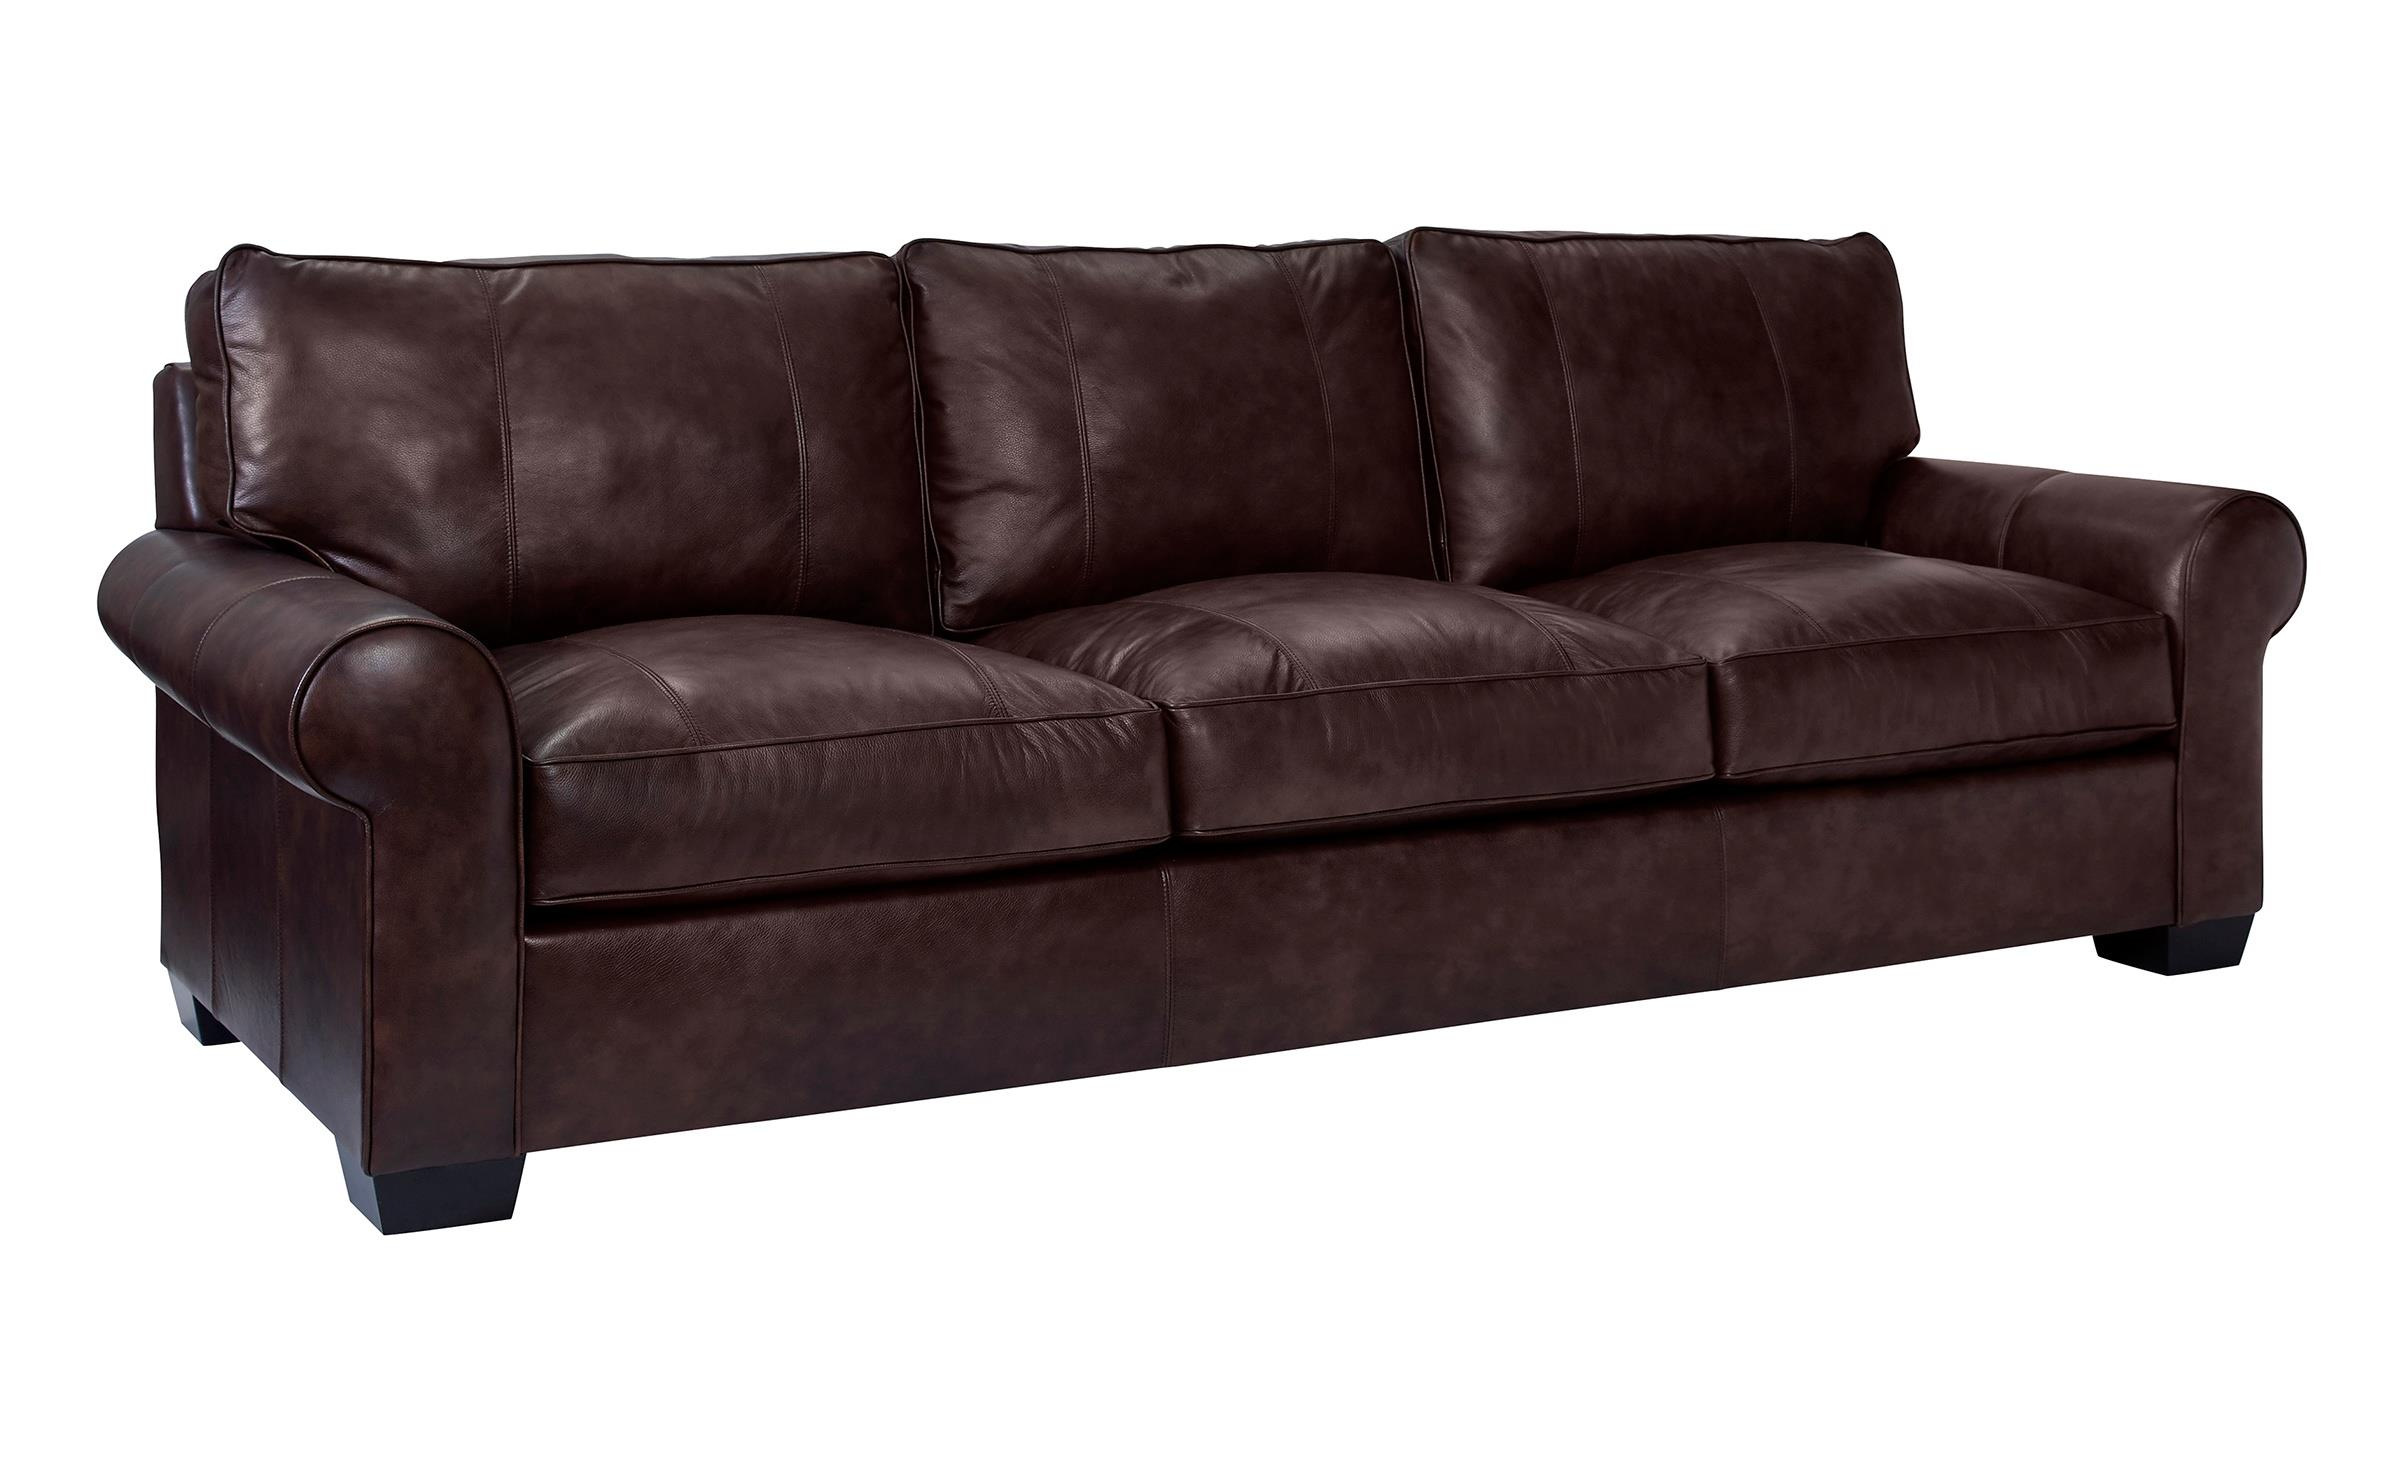 Broyhill furniture isadore casual sofa wayside furniture for Wayside furniture